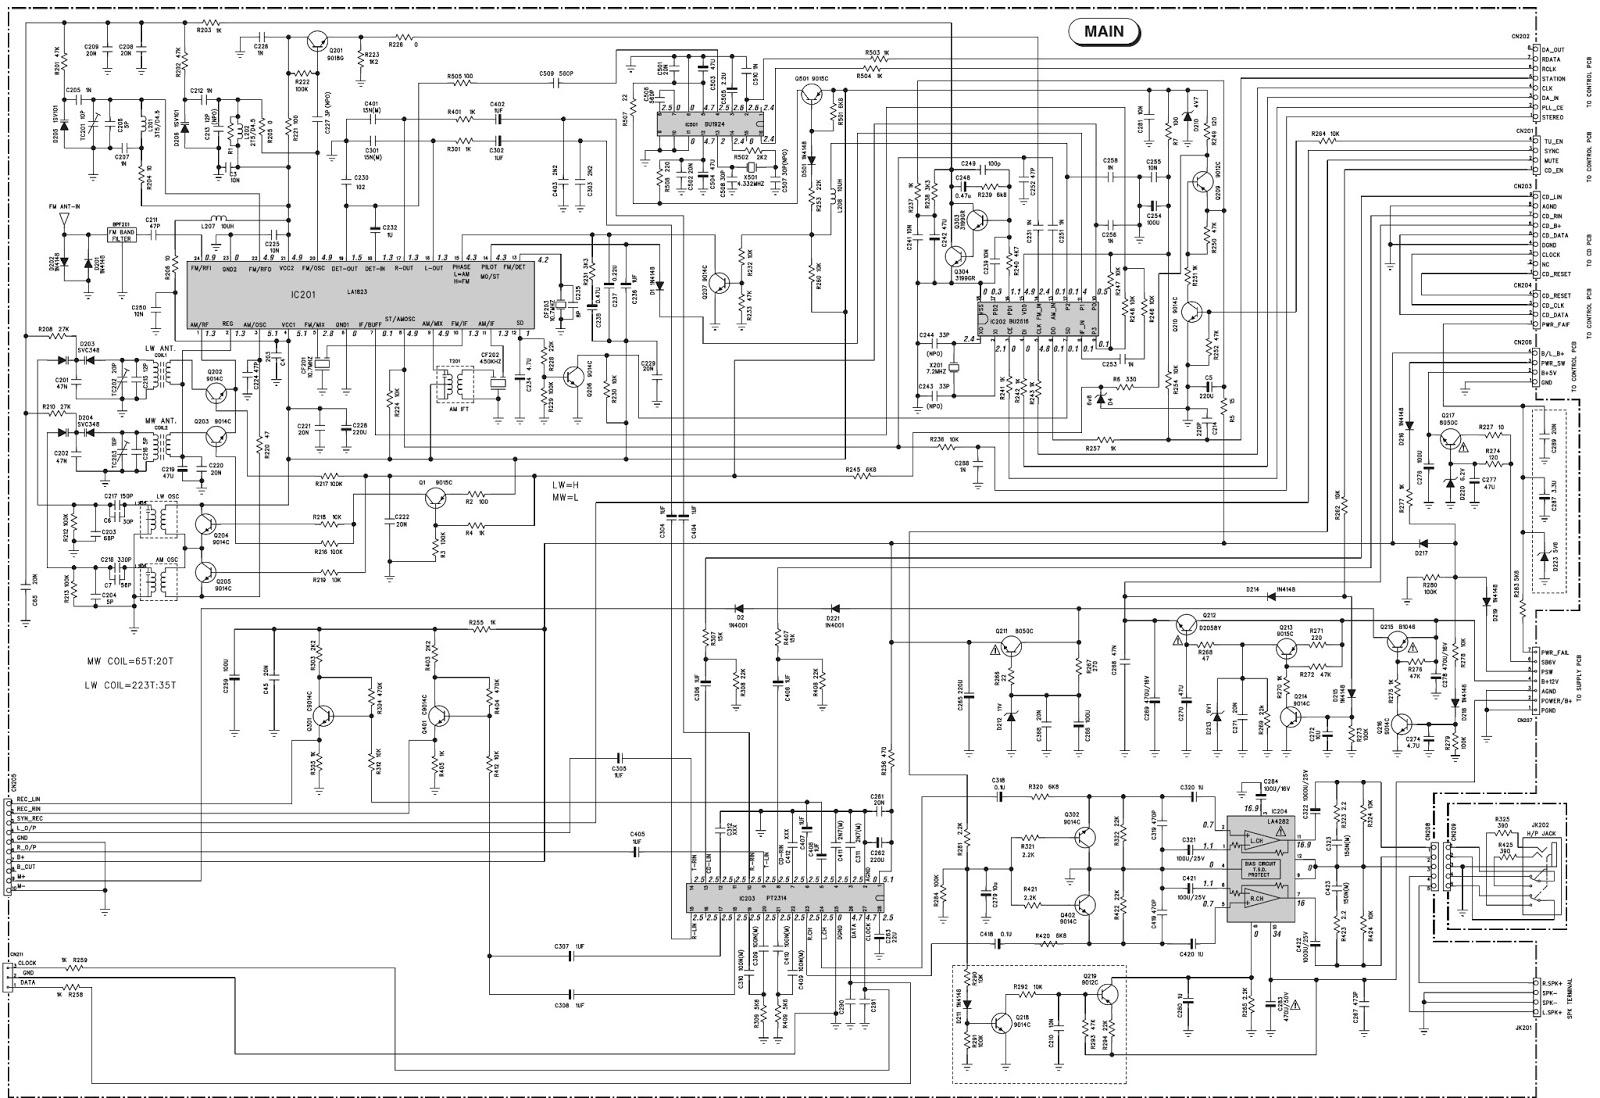 hight resolution of yamaha schematic diagram 24 wiring diagram images yamaha g5 amp schematic yamaha g5 amp schematic